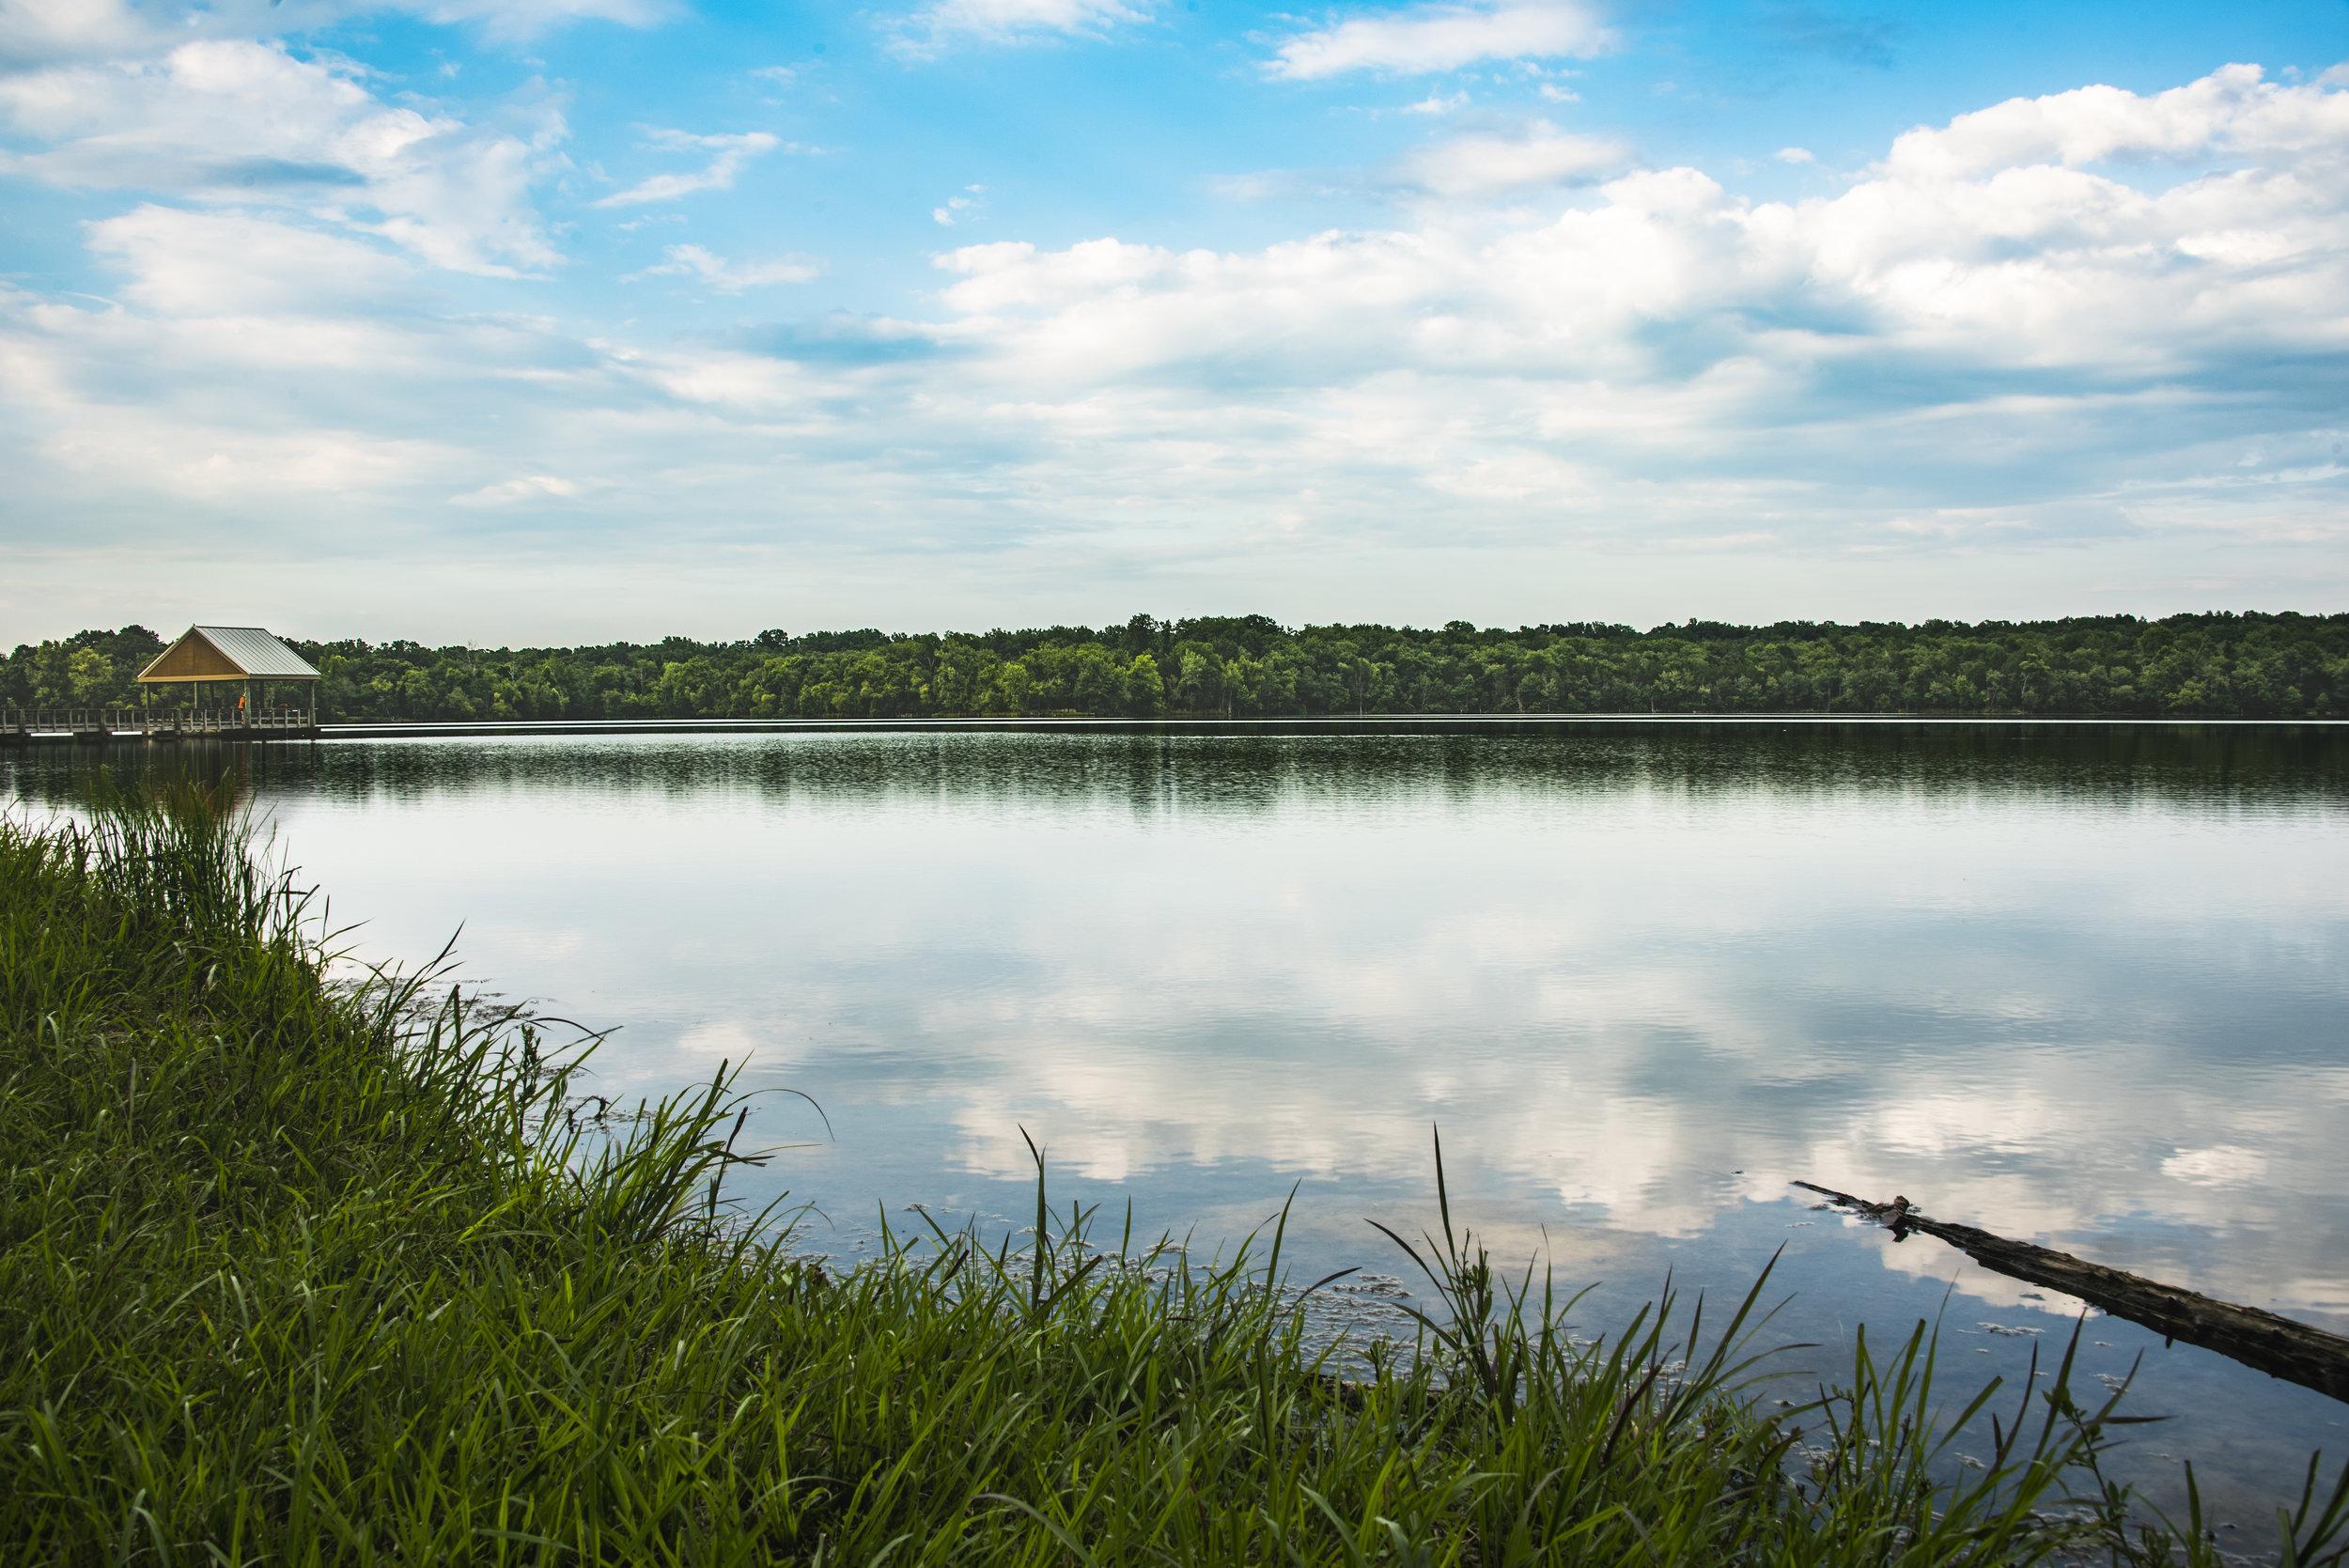 2018B_Landscape_Longhunterstatepark_Hcolburn.jpg